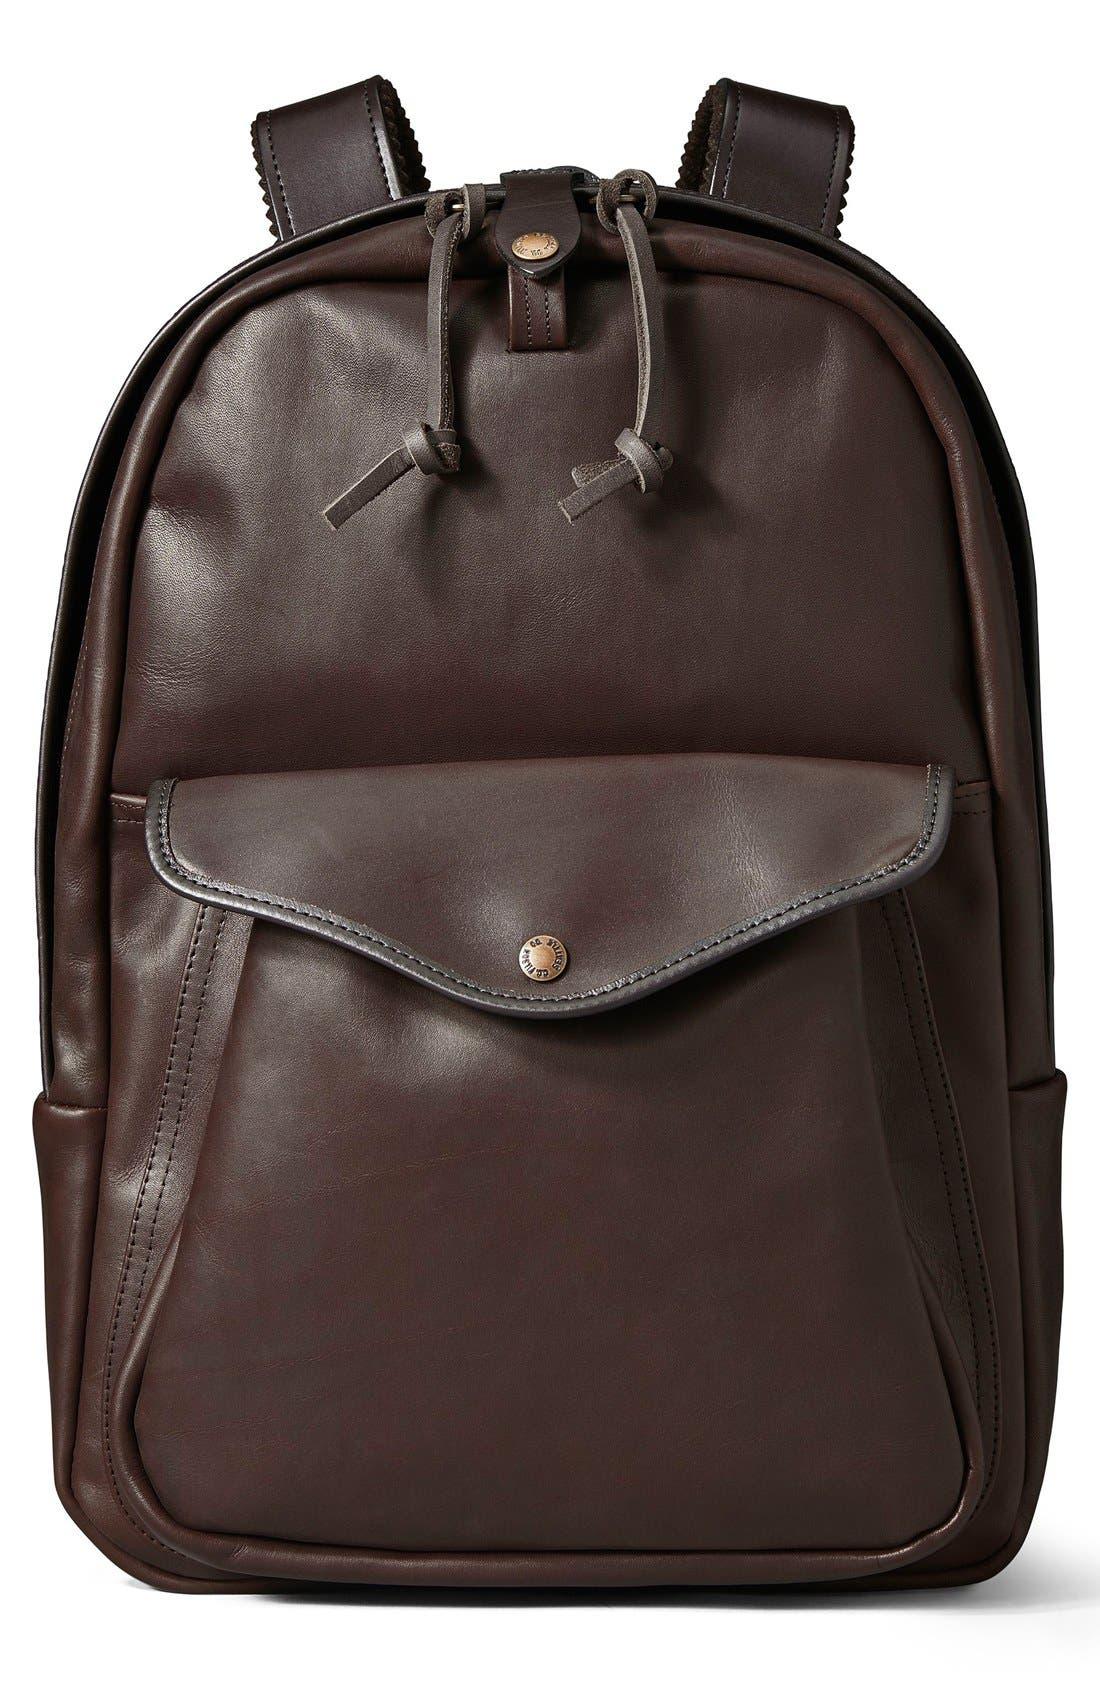 Filson Weatherproof Leather Backpack